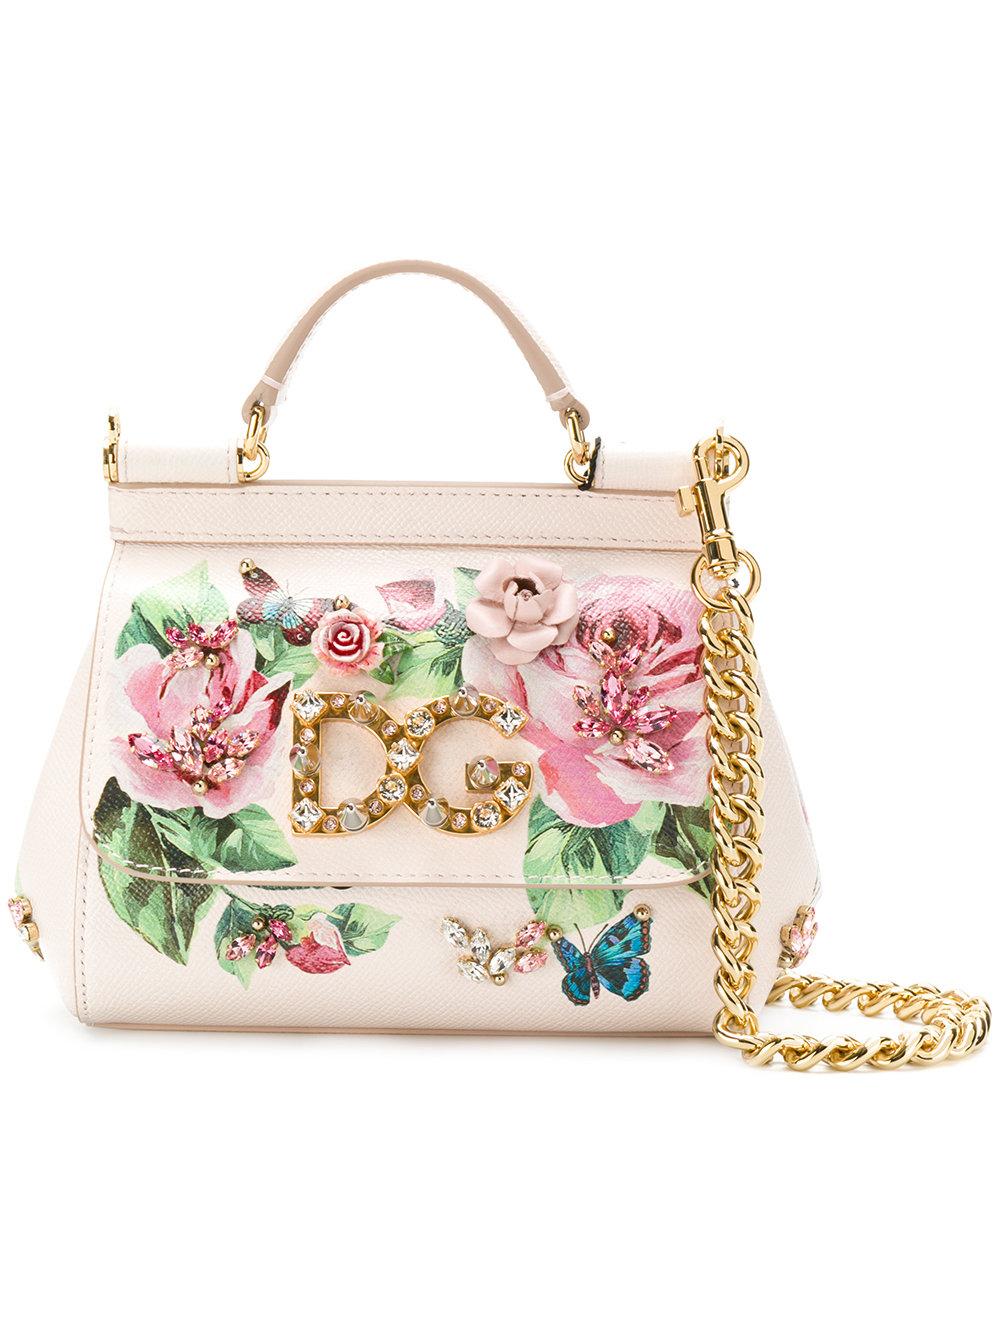 uu dai mua He 2018 - elle man - Dolce&Gabbana